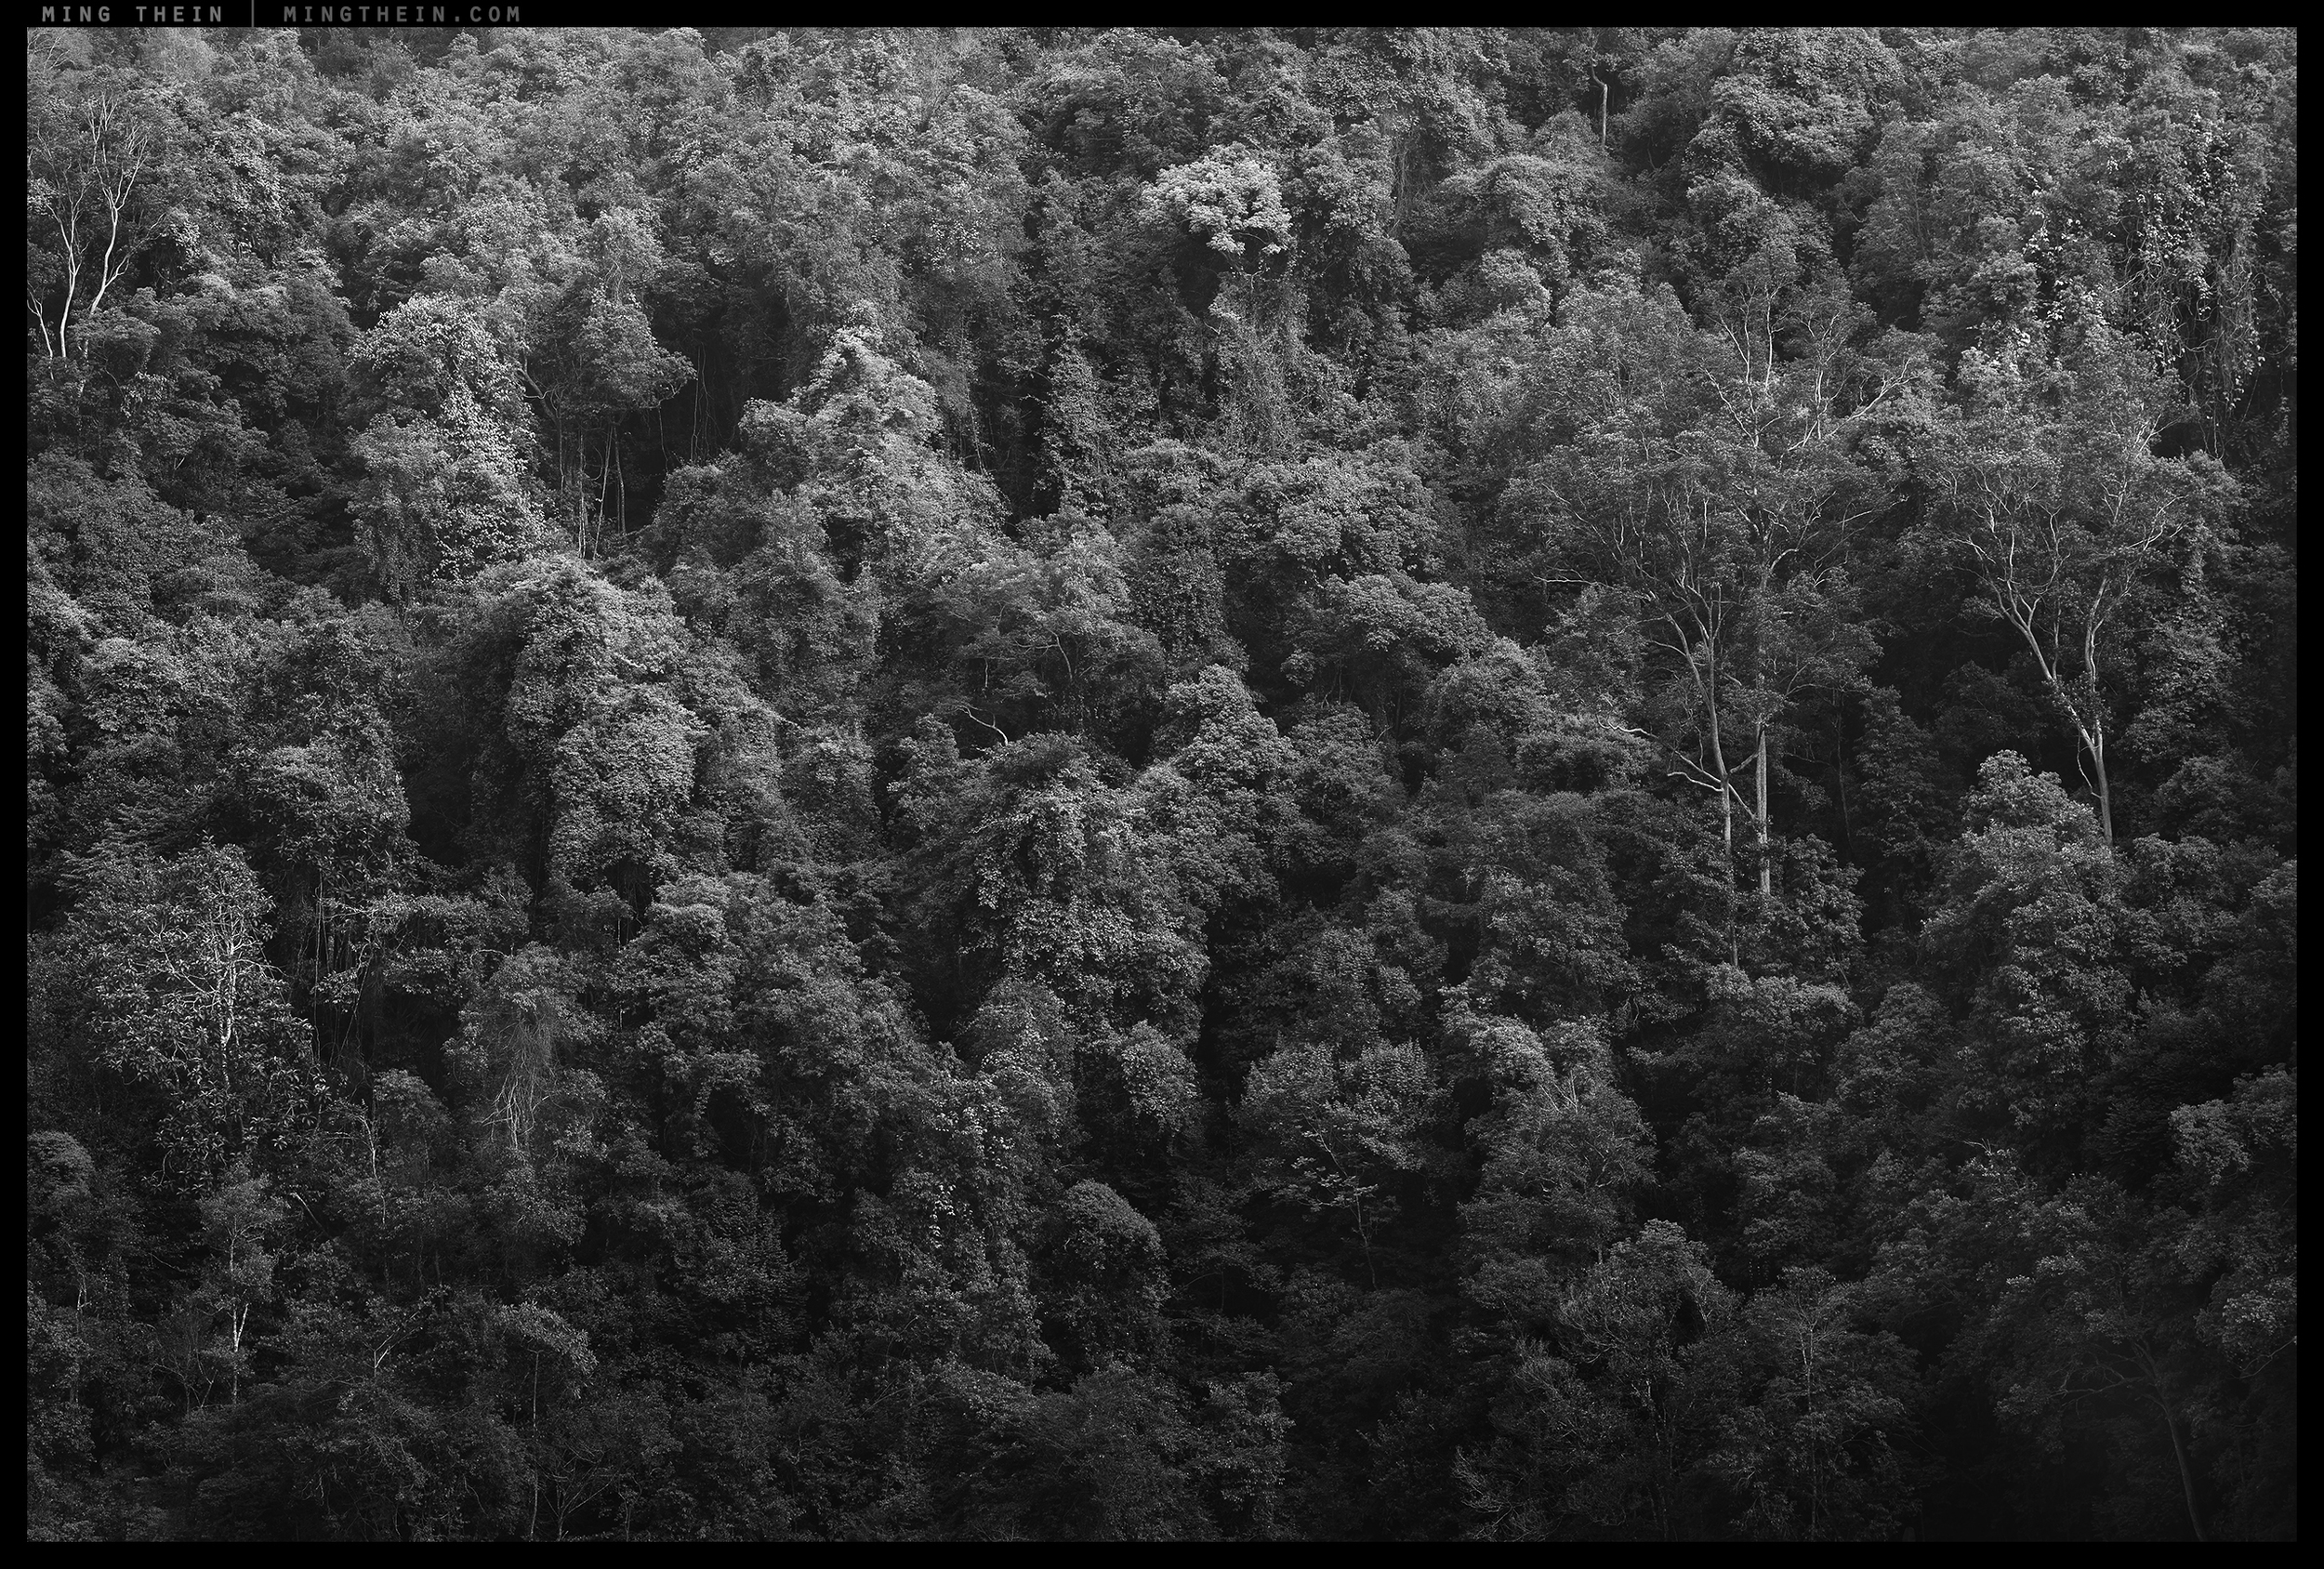 _8A03802 forest II.jpg